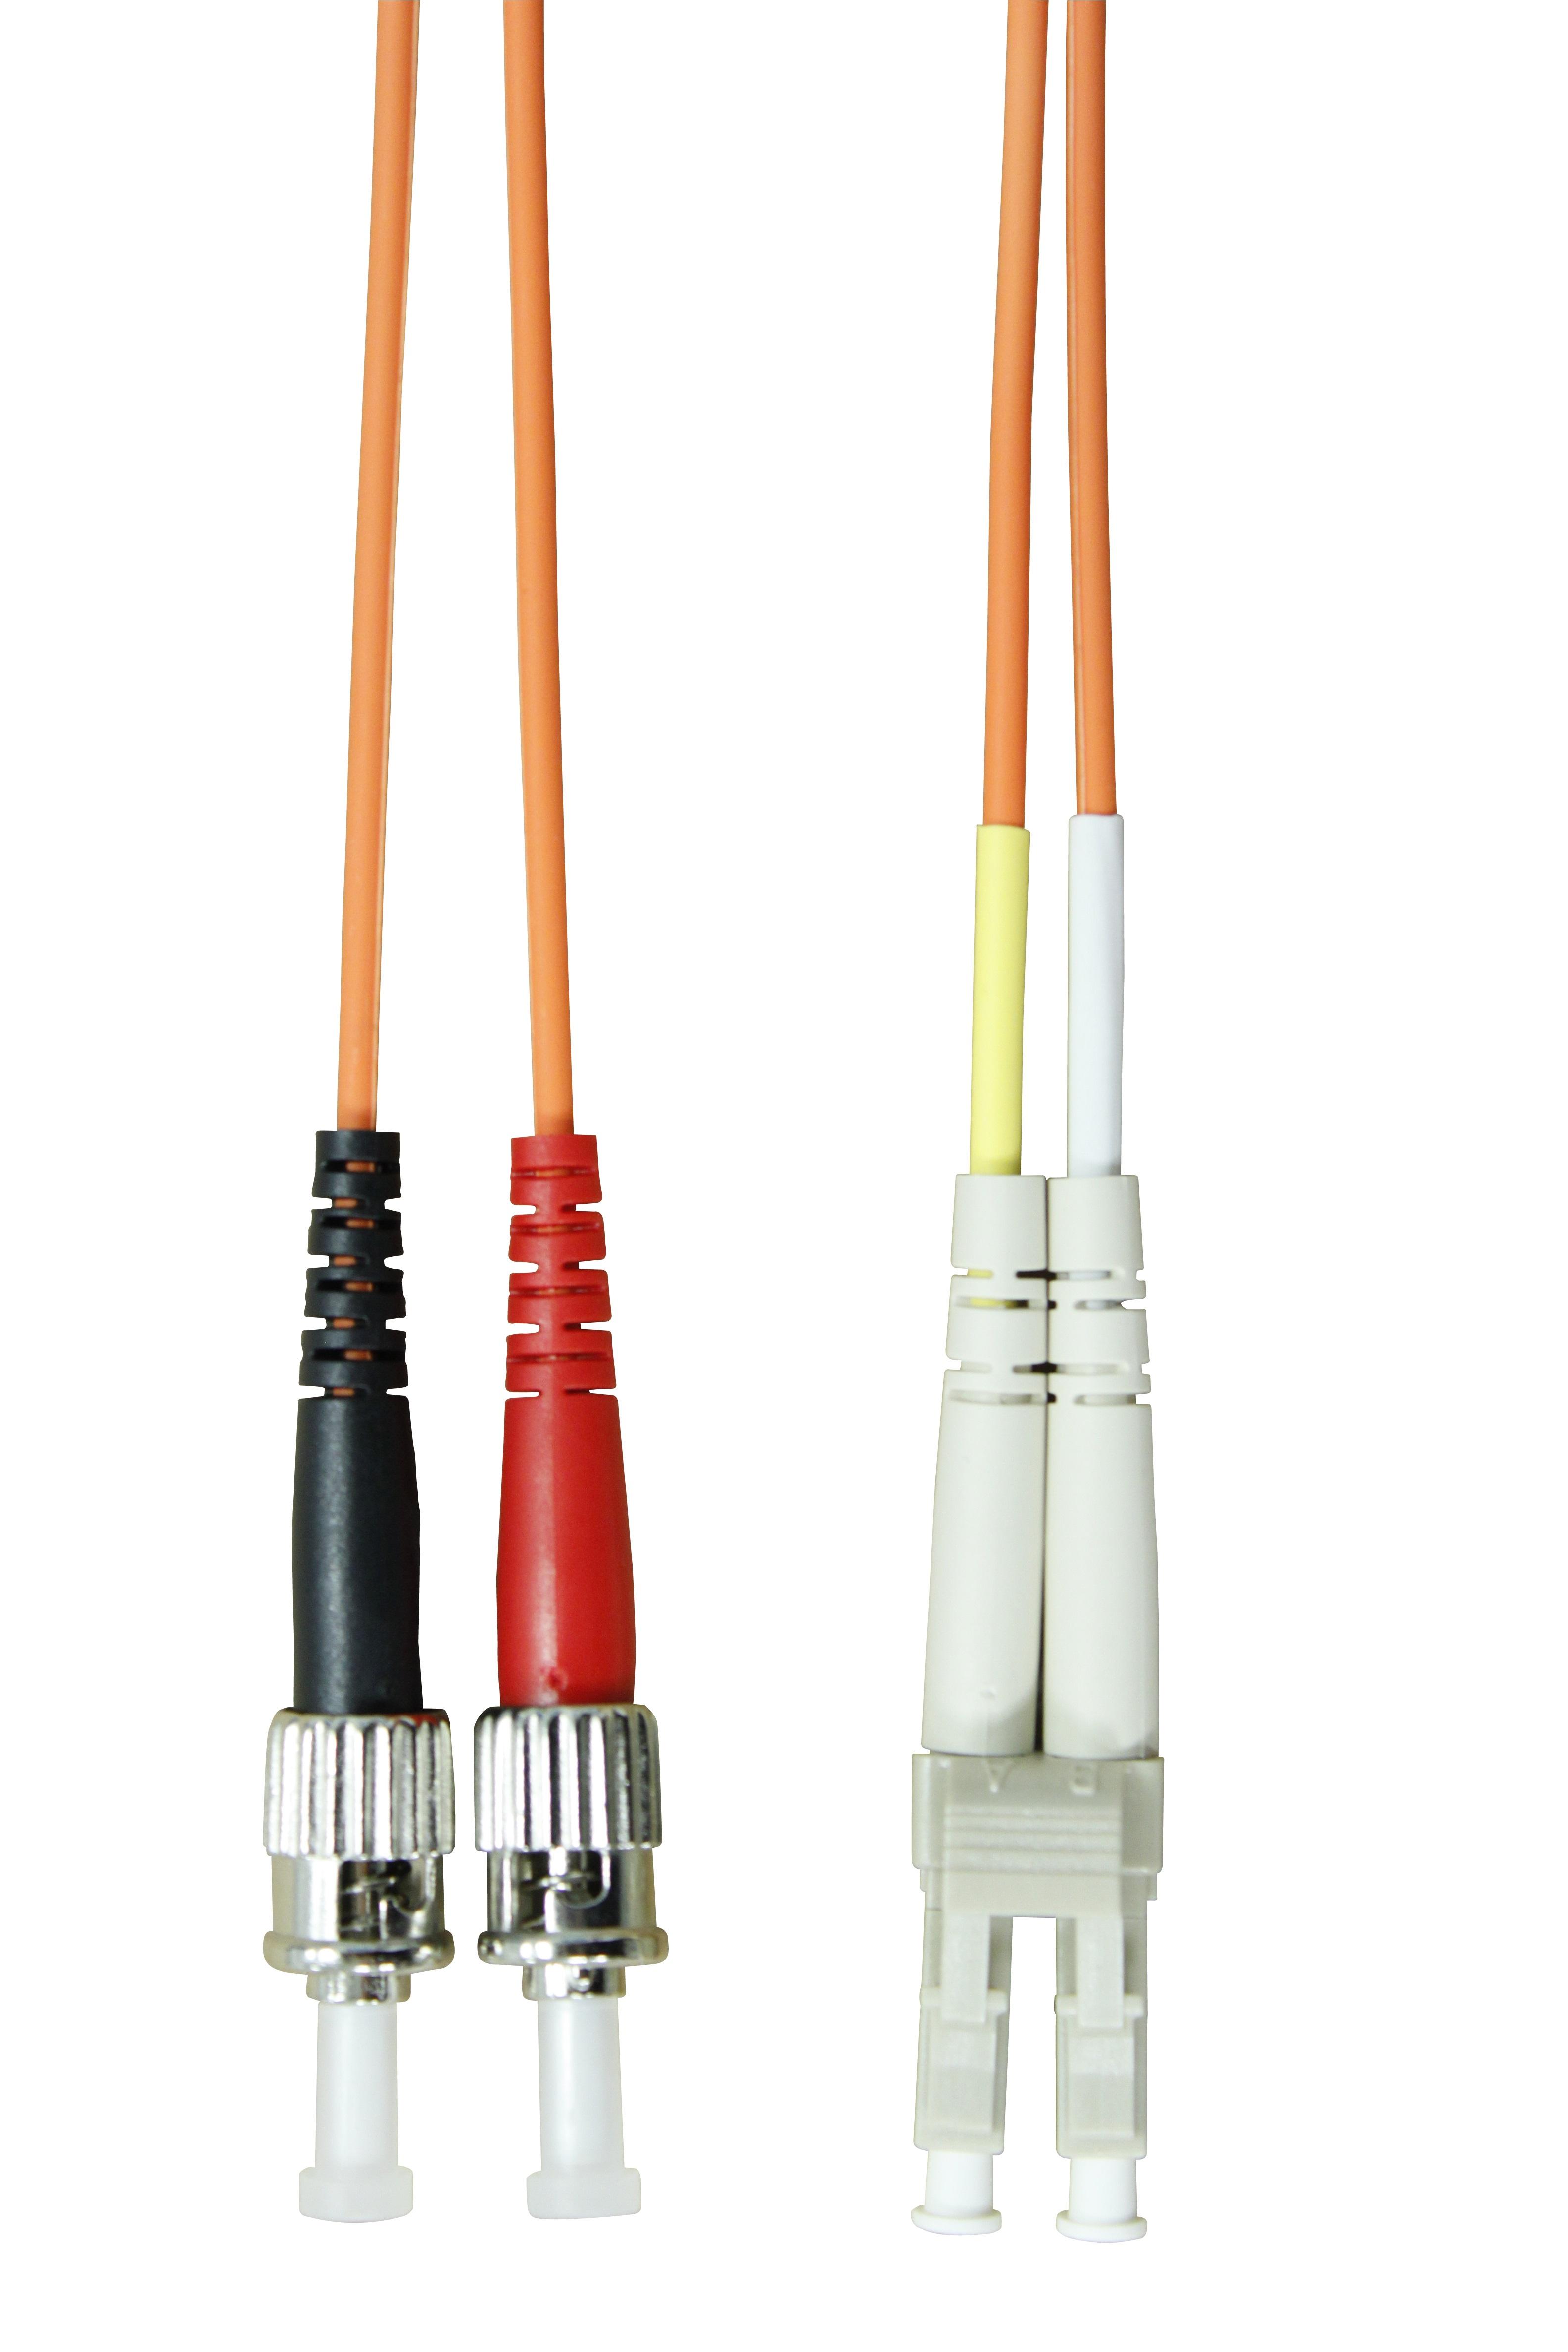 1 Stk LWL Patchkabel Duplex LC / ST,50/125µm OM2,LS0H-3,orange, 5m HLP25LT05F